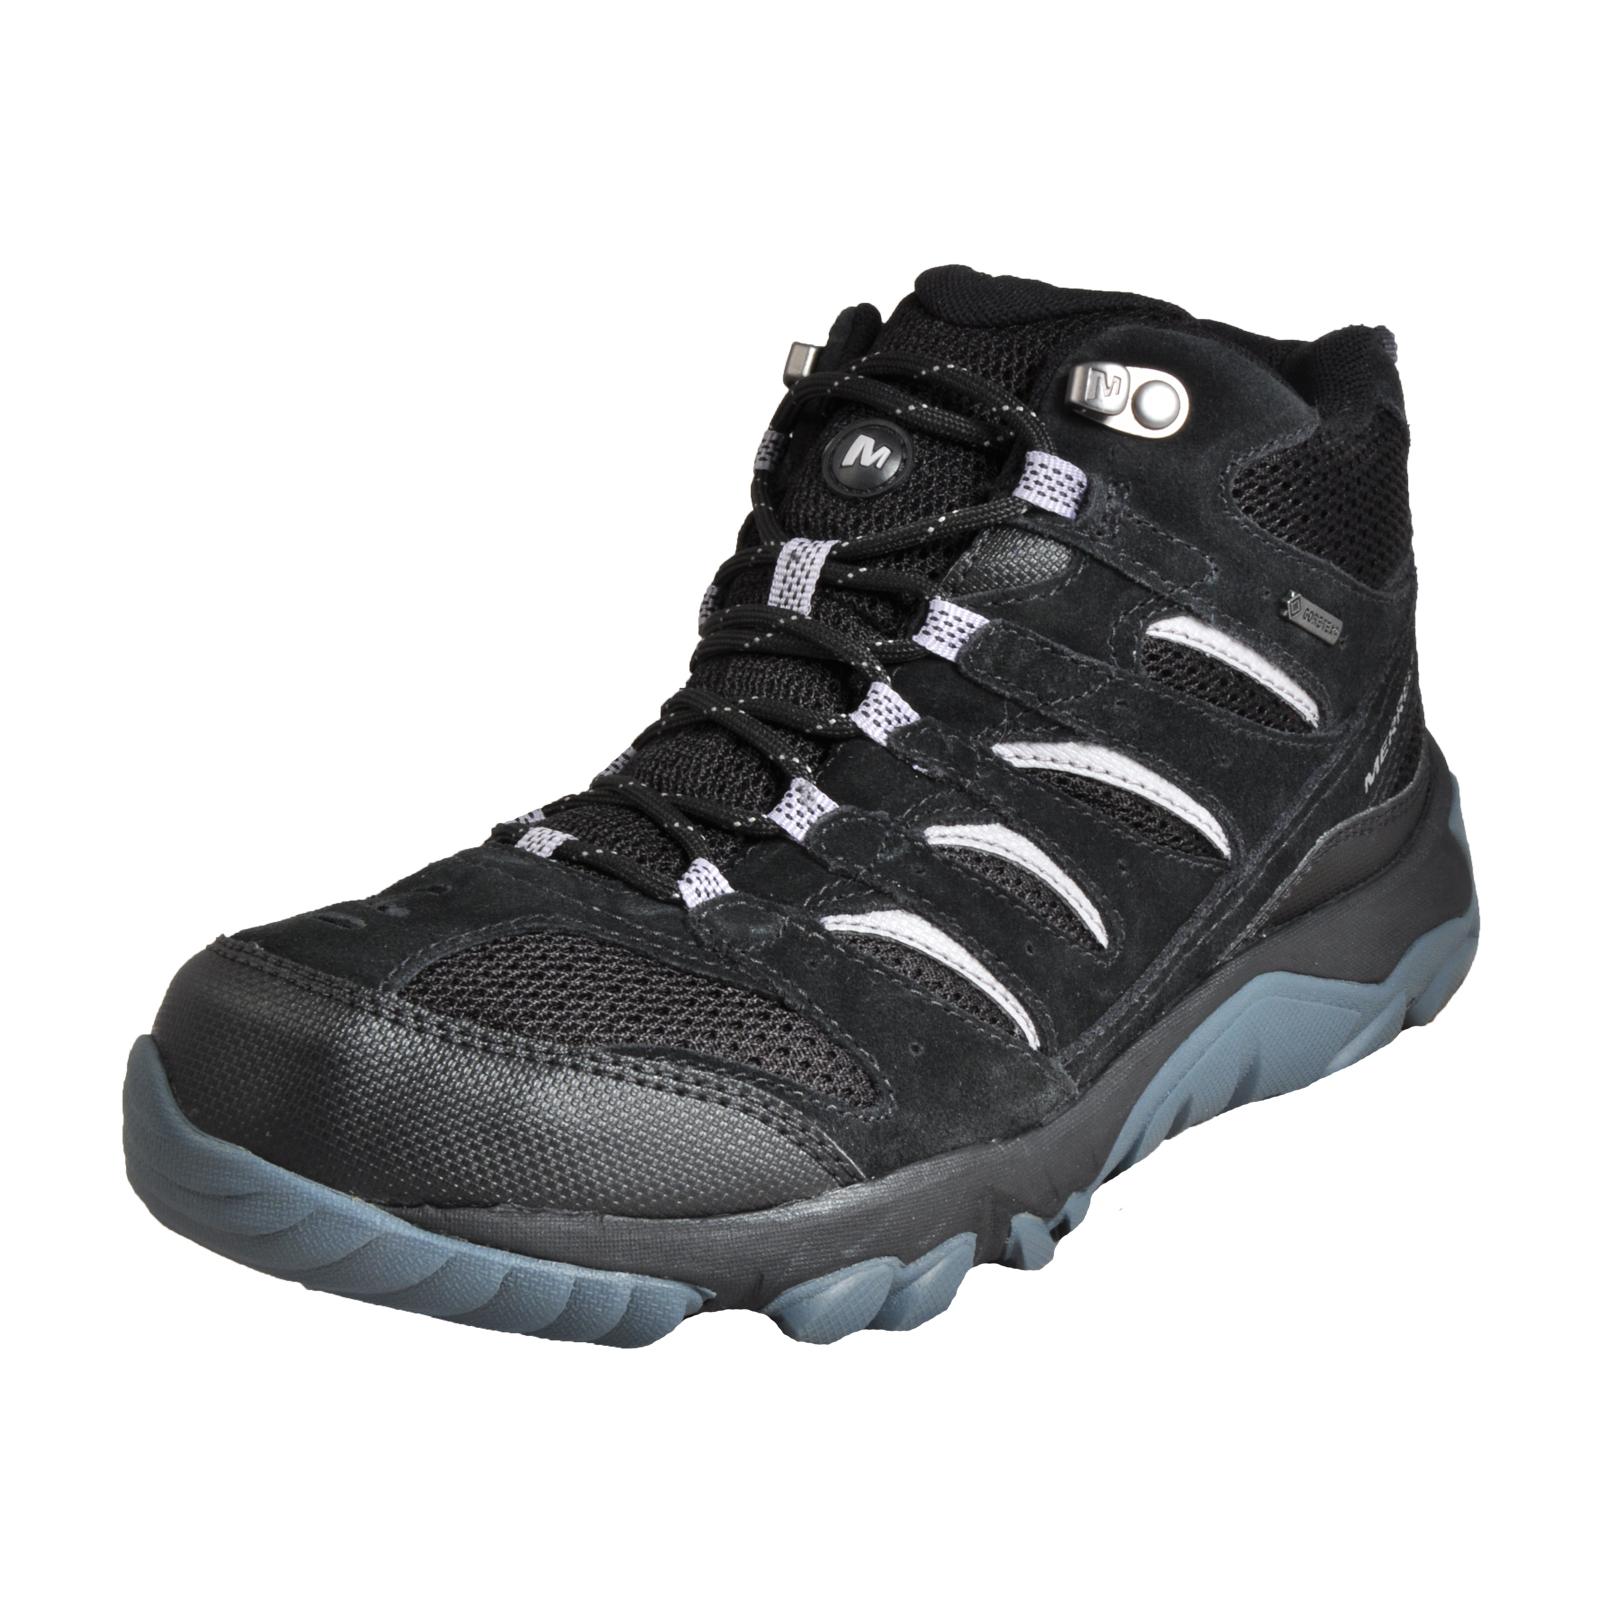 01f88f5afdc5 Merrell White Pine Mid Ventilator Gore-Tex Waterproof Men s Outdoor Hiking  Boots Black